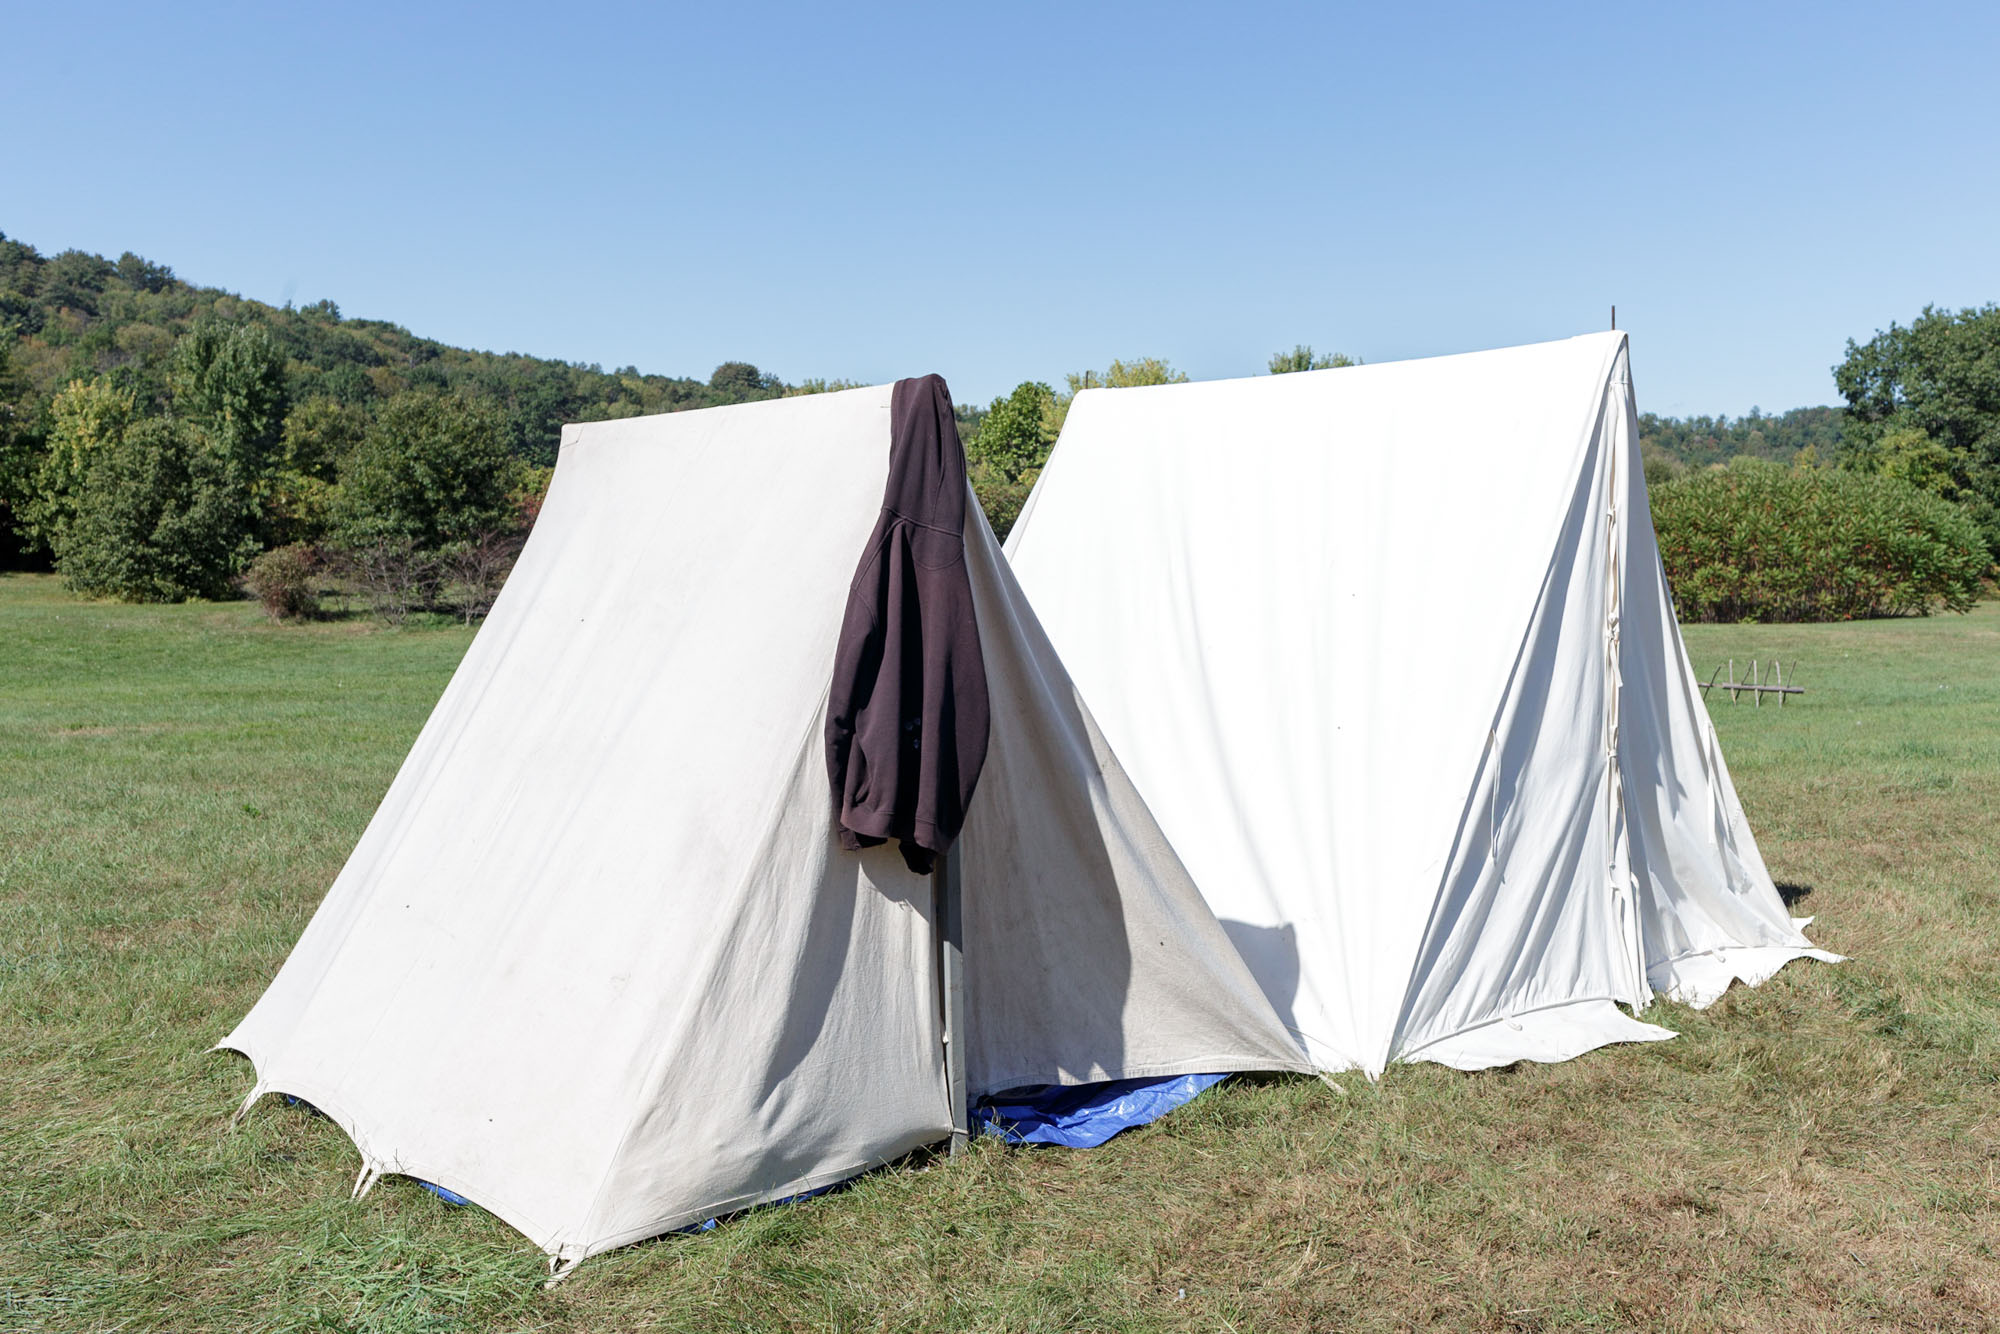 Sweatshirt and Tents